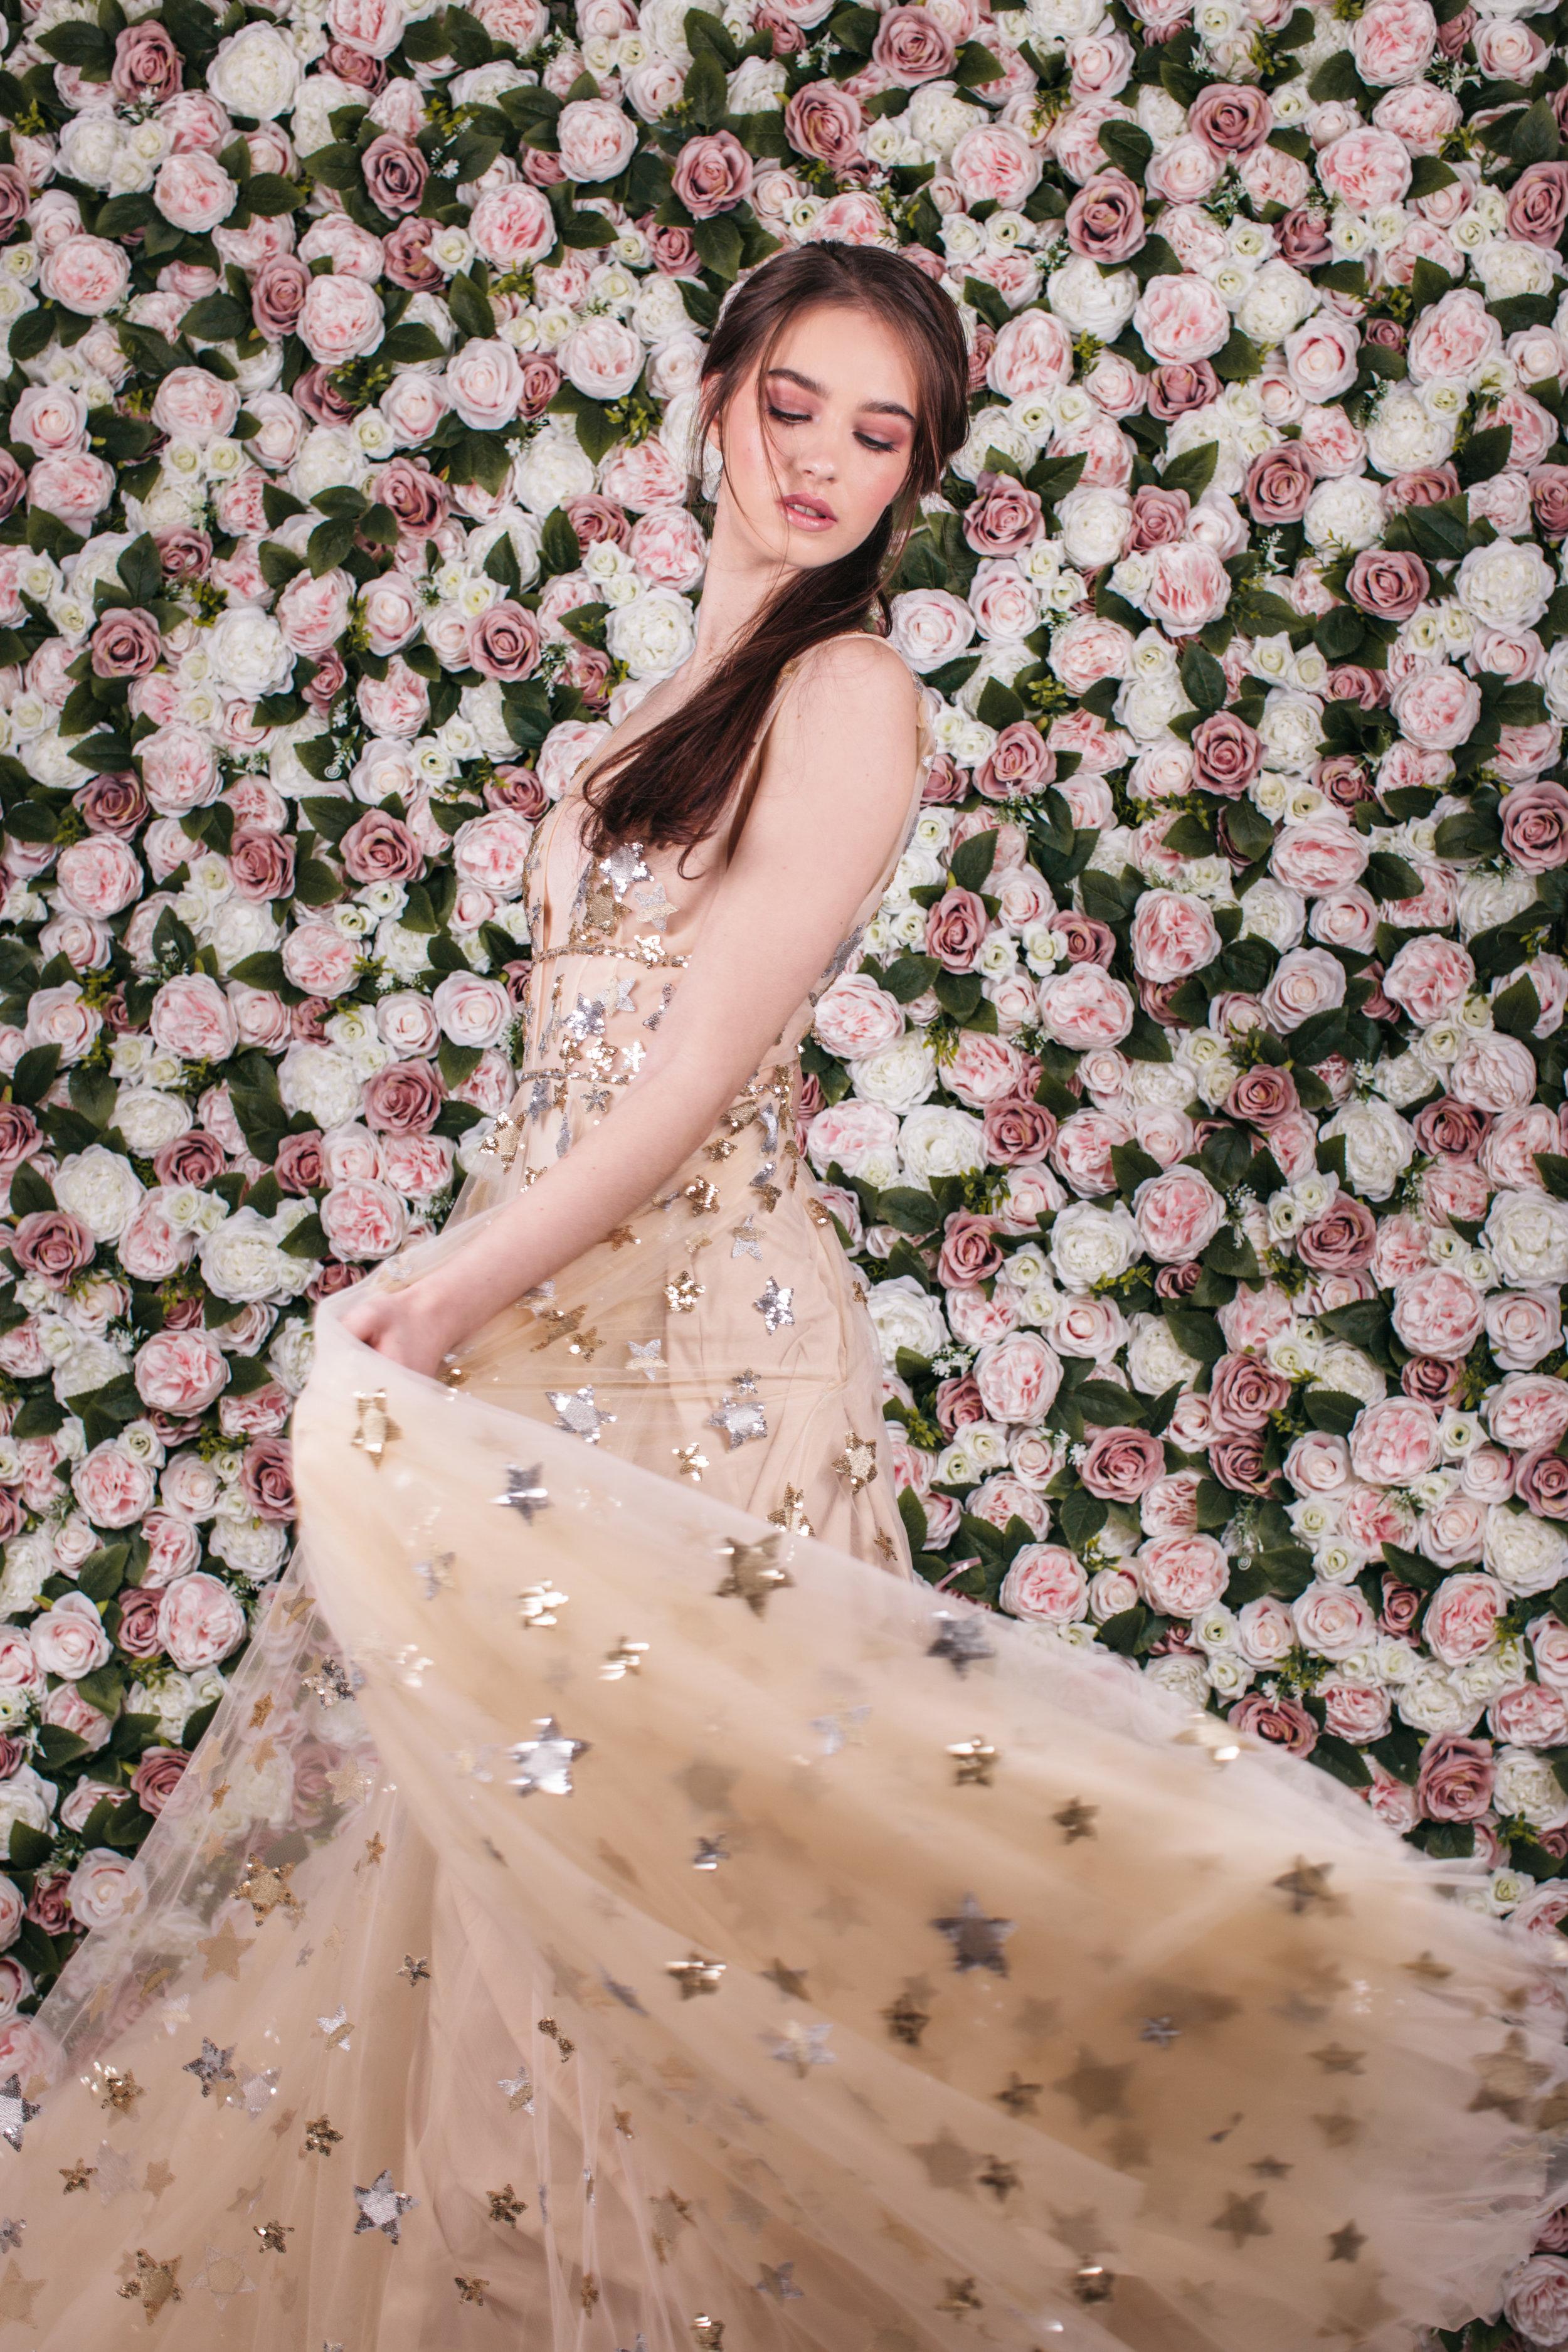 emma barrow flora hello petal your devon and cornwall wedding magazine willowby